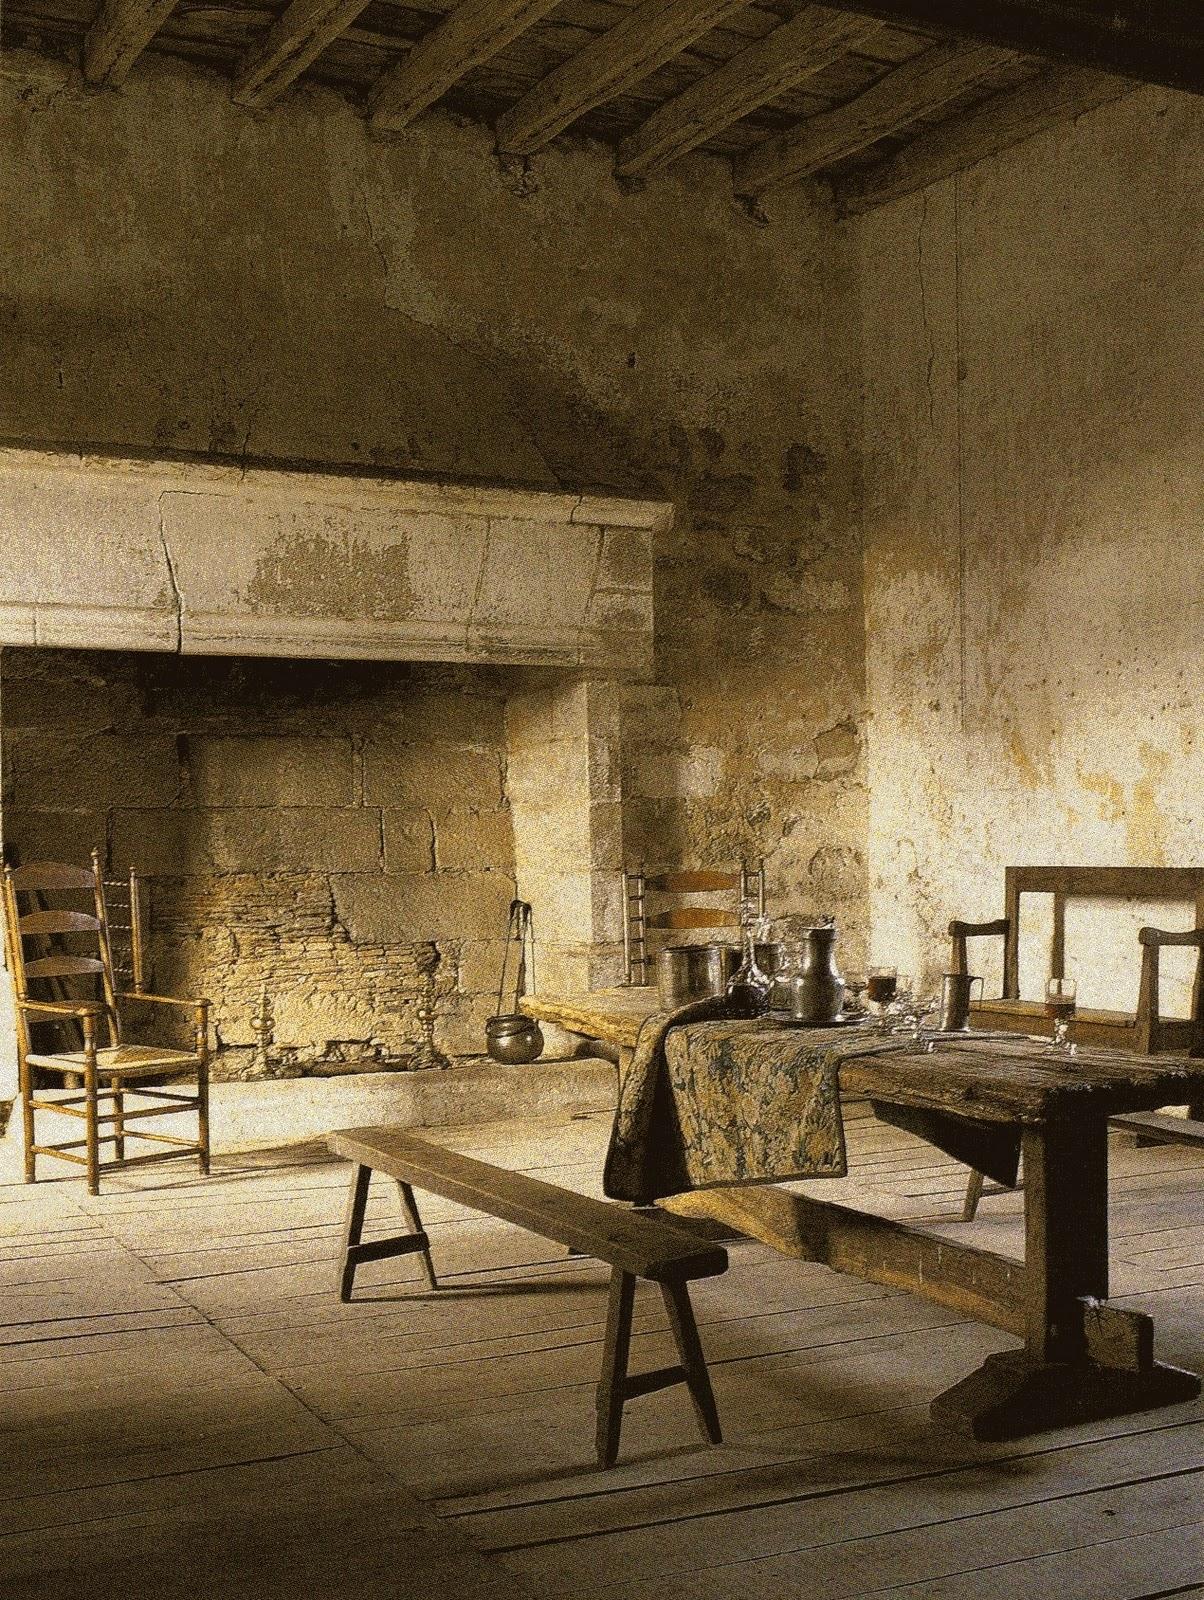 La maison boheme artist 39 s light for French country stone fireplace